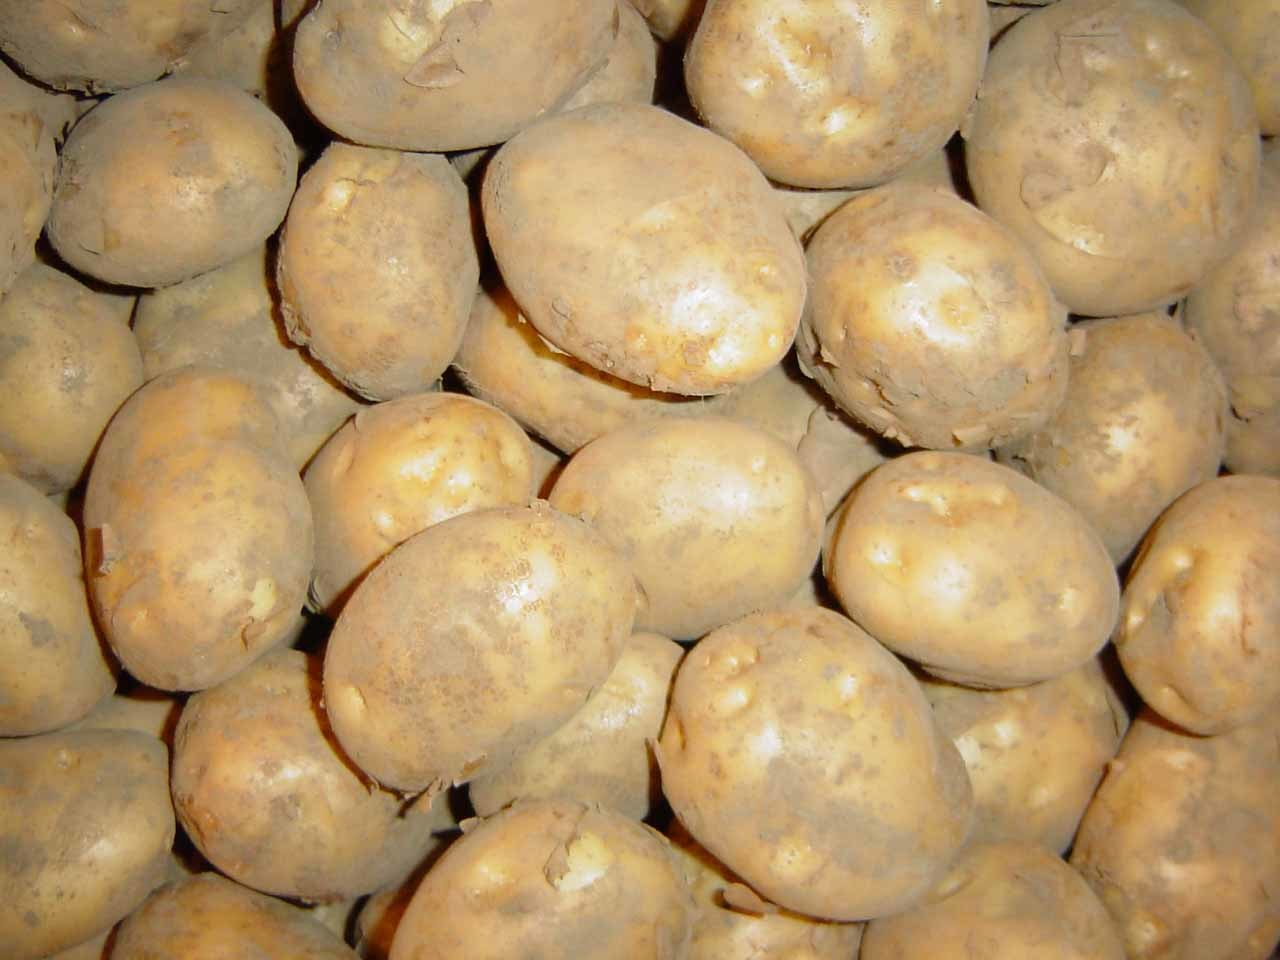 China Potato - ...